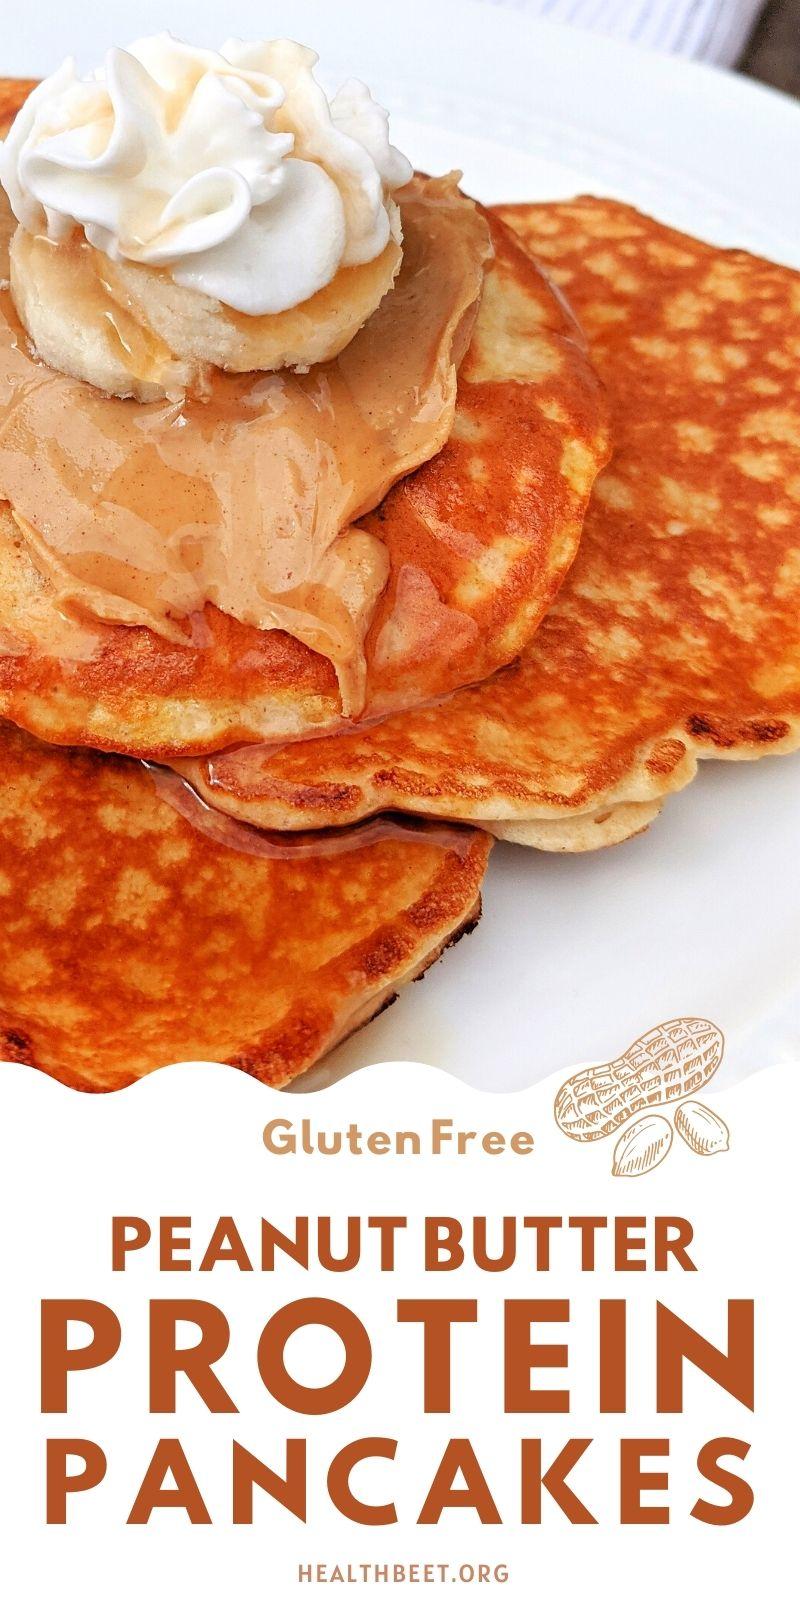 Gluten free peanut butter protein pancakes